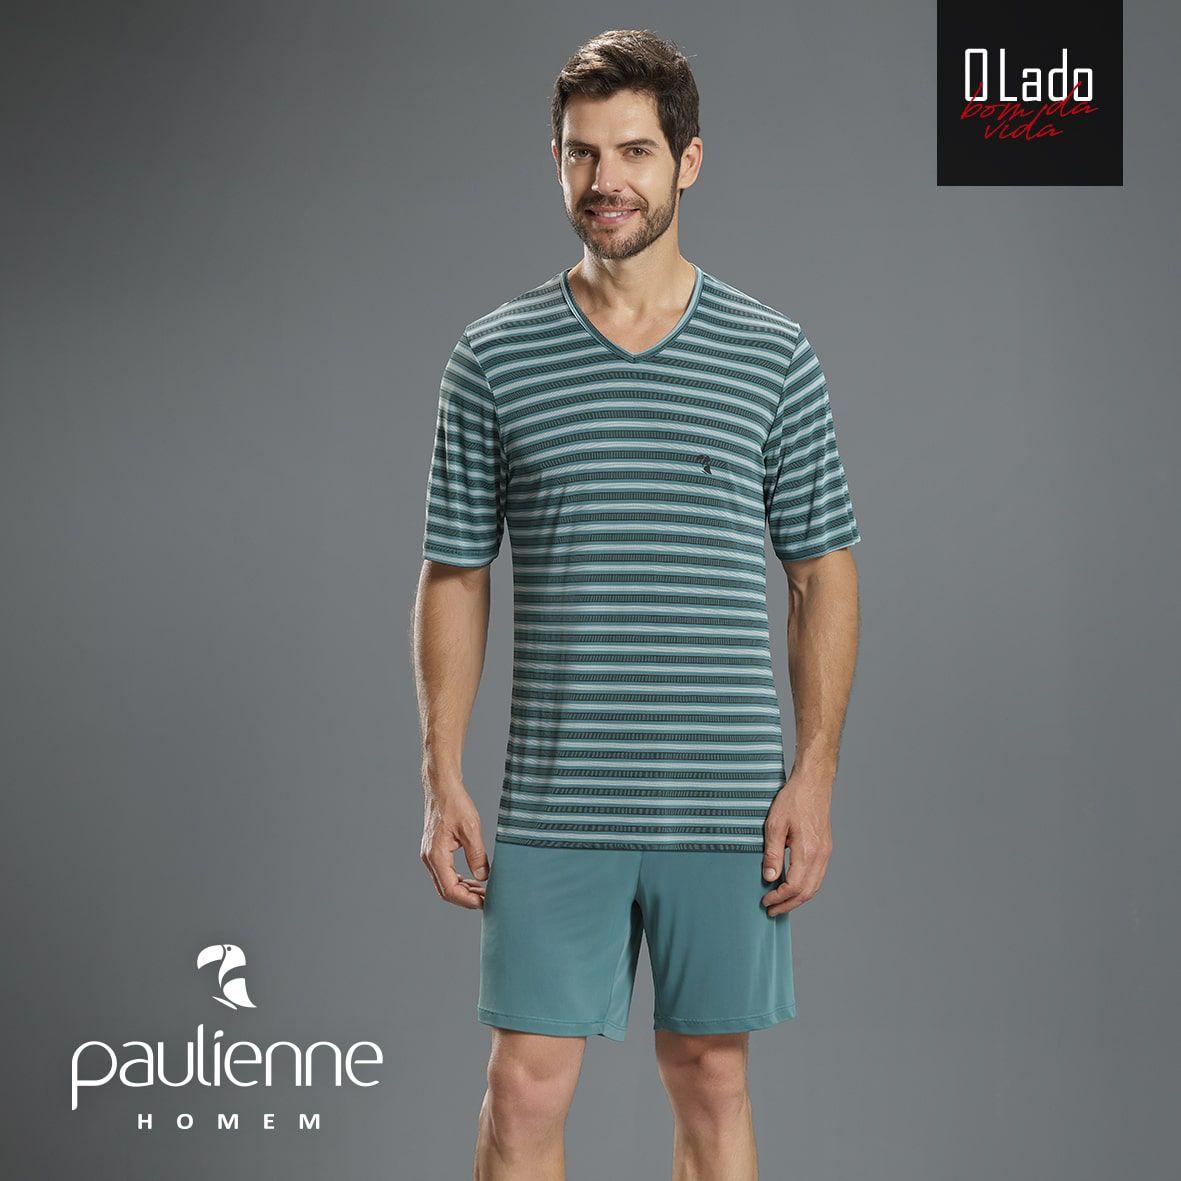 Pijama Masculino Curto Paulienne Blusa Listrada e Bermuda em Liganete Plus Size